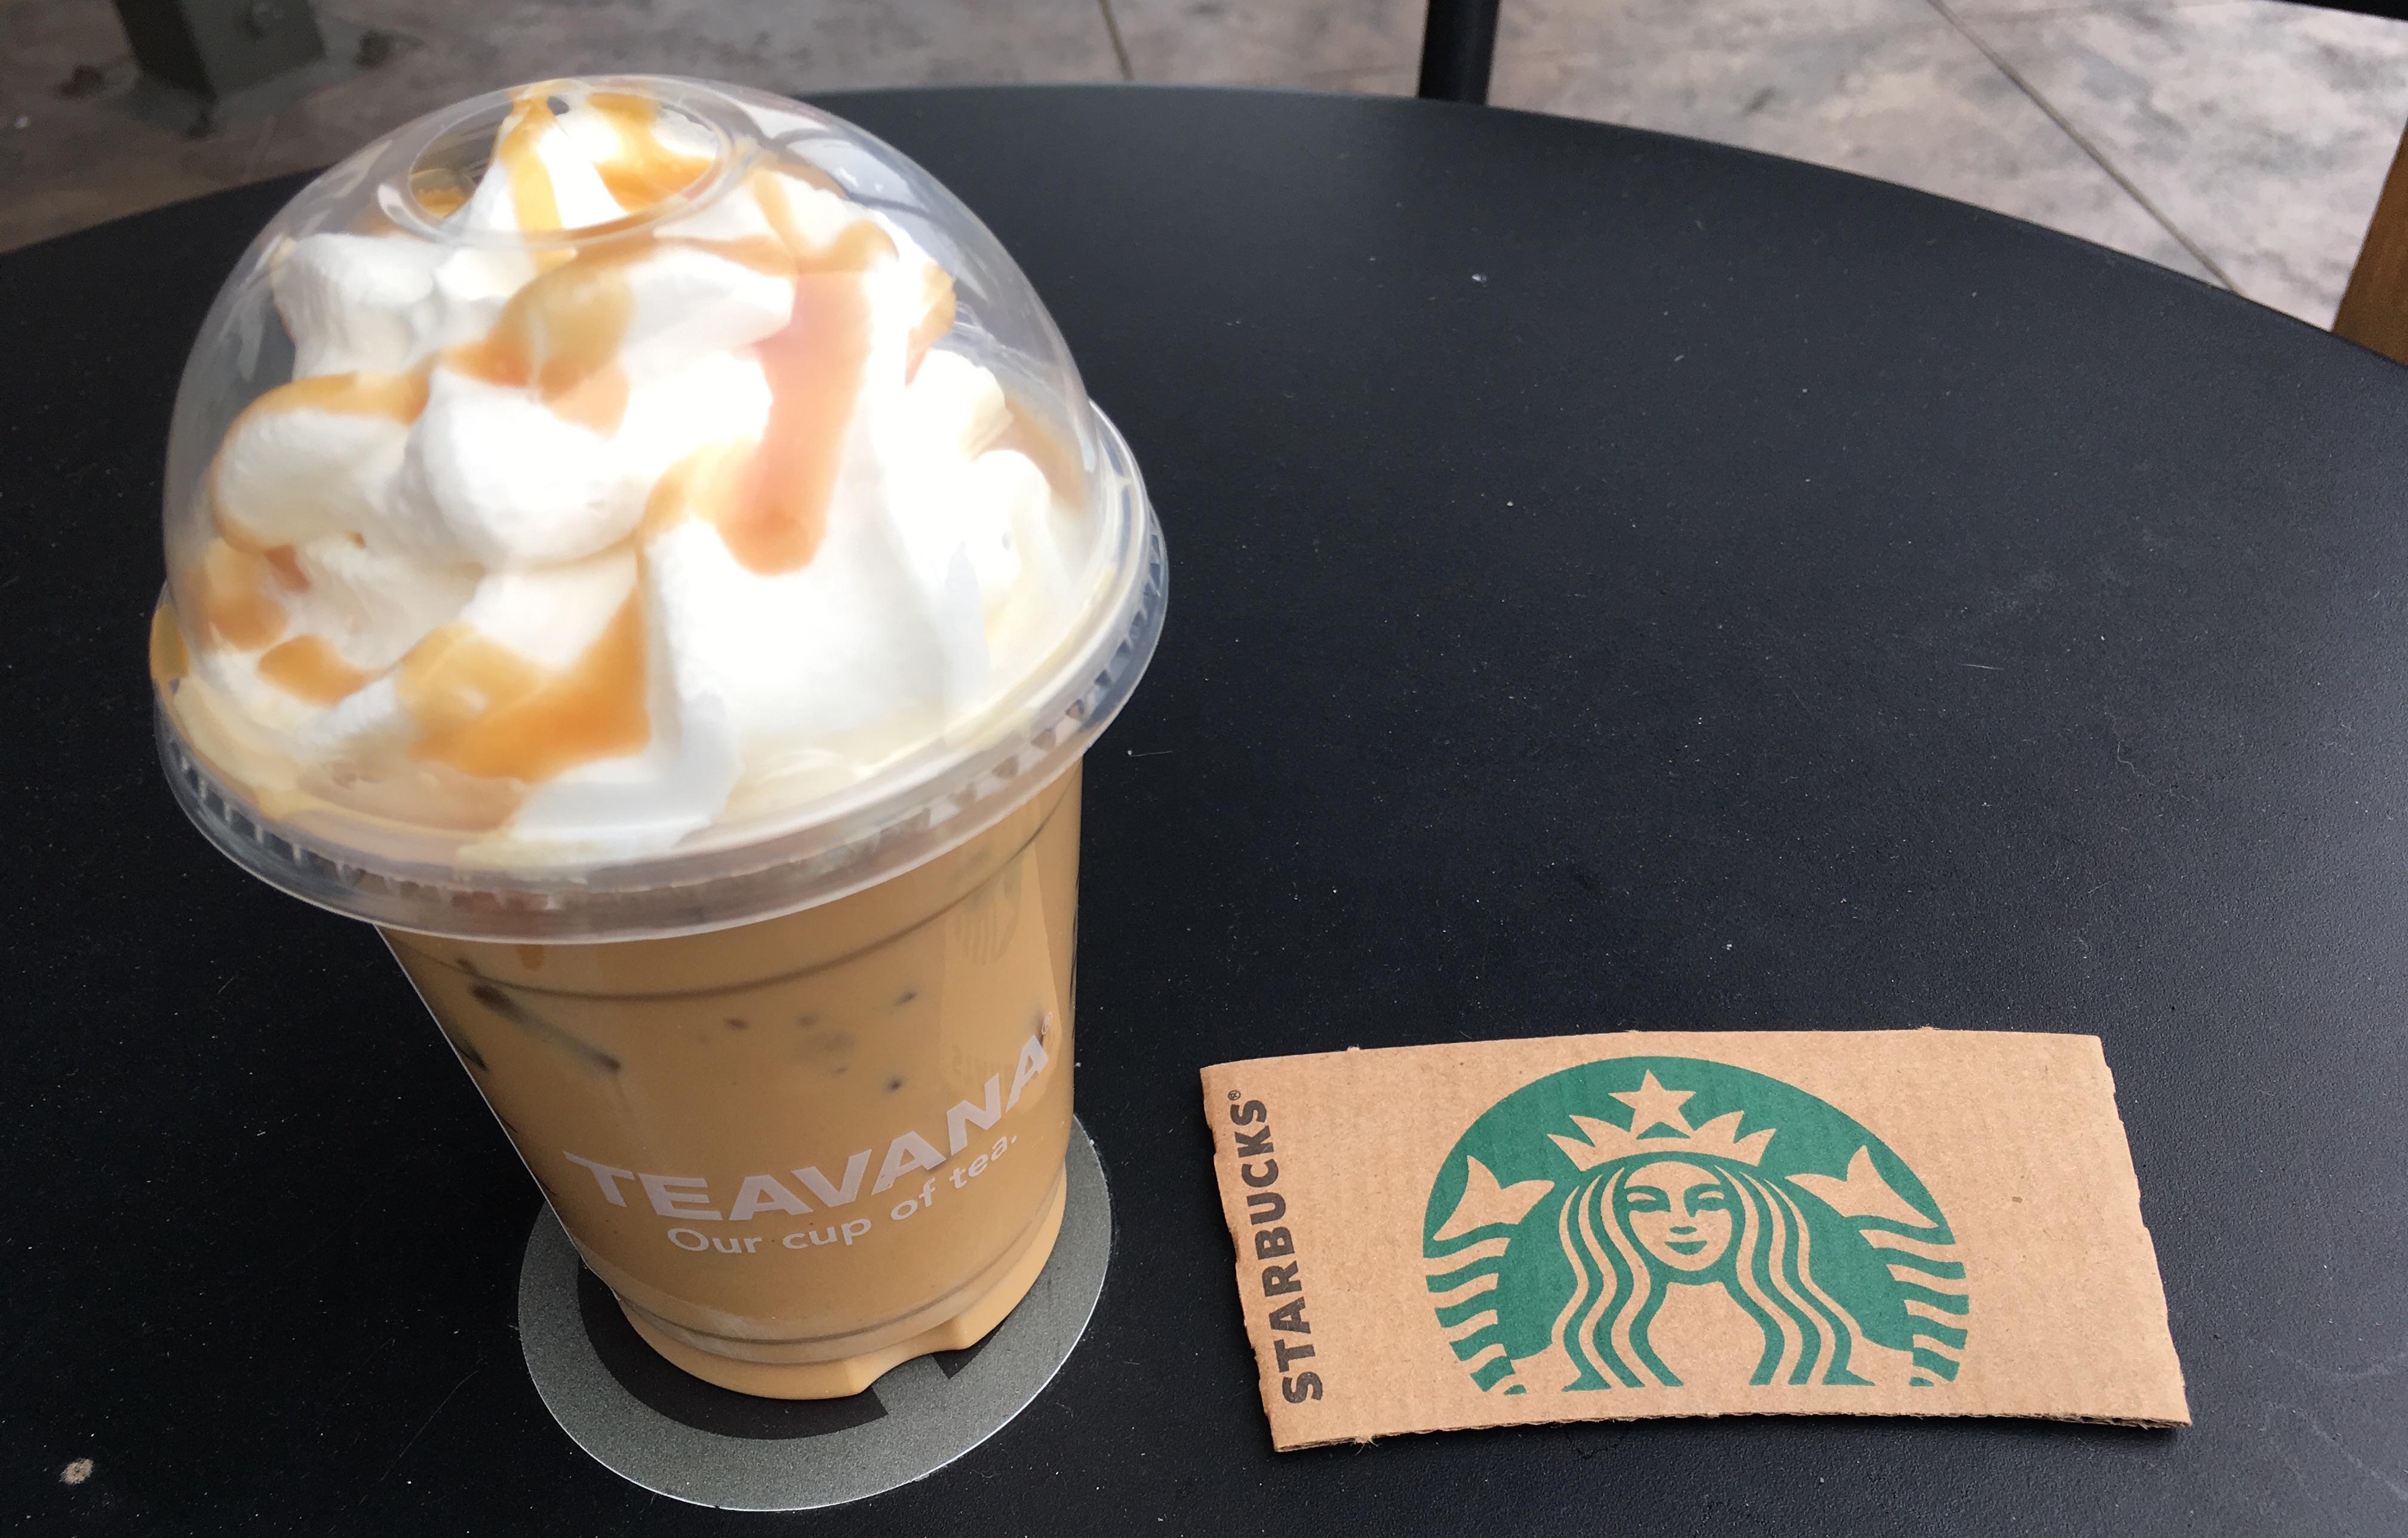 Low Carb Starbucks Drinks Guide For Keto Dieters Mr SkinnyPants